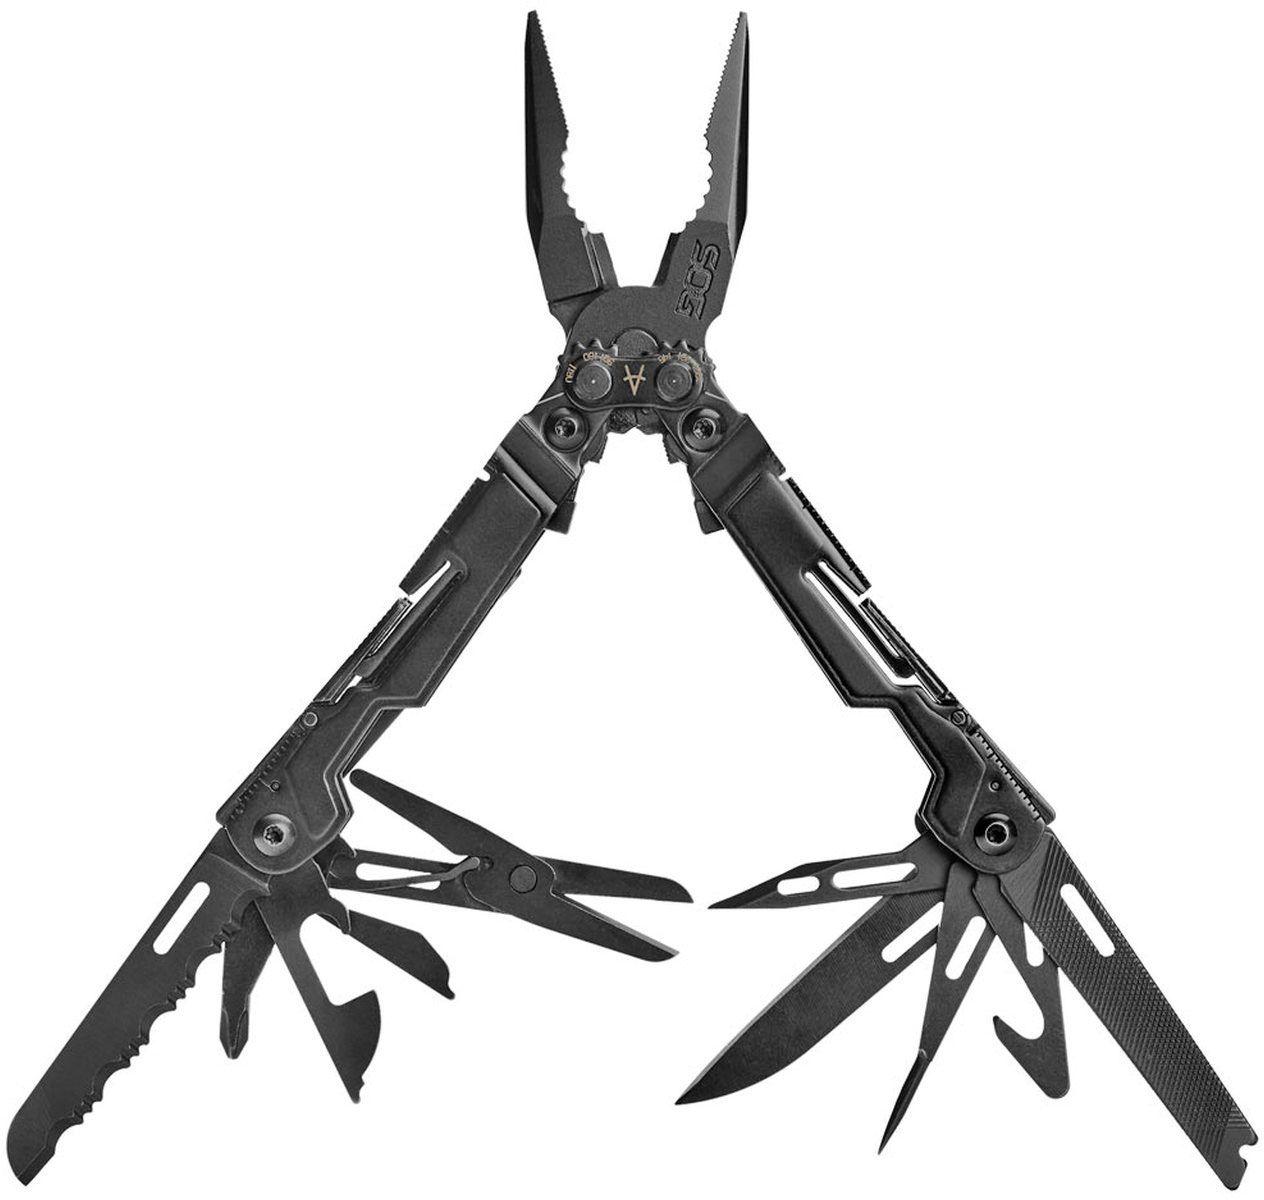 SOG PowerPint Multi-Tool (Black) with 18 Tools